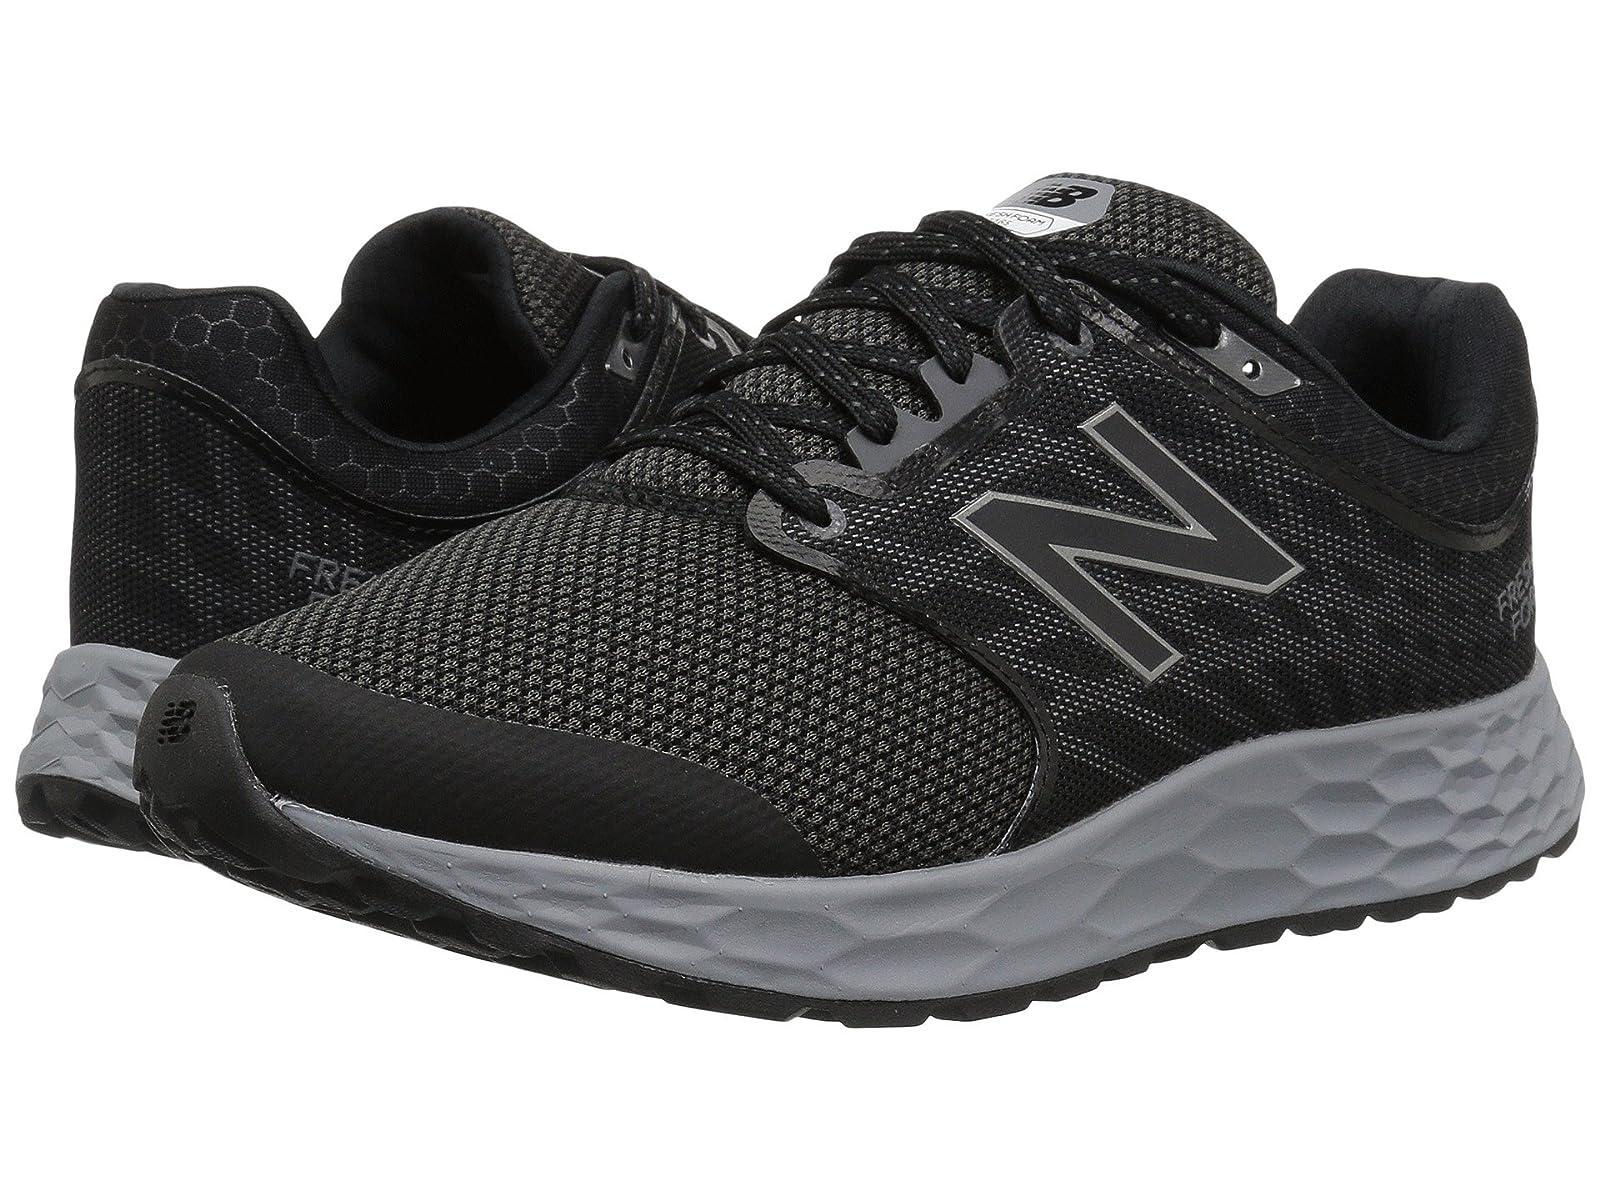 New Balance 1165v1Atmospheric grades have affordable shoes